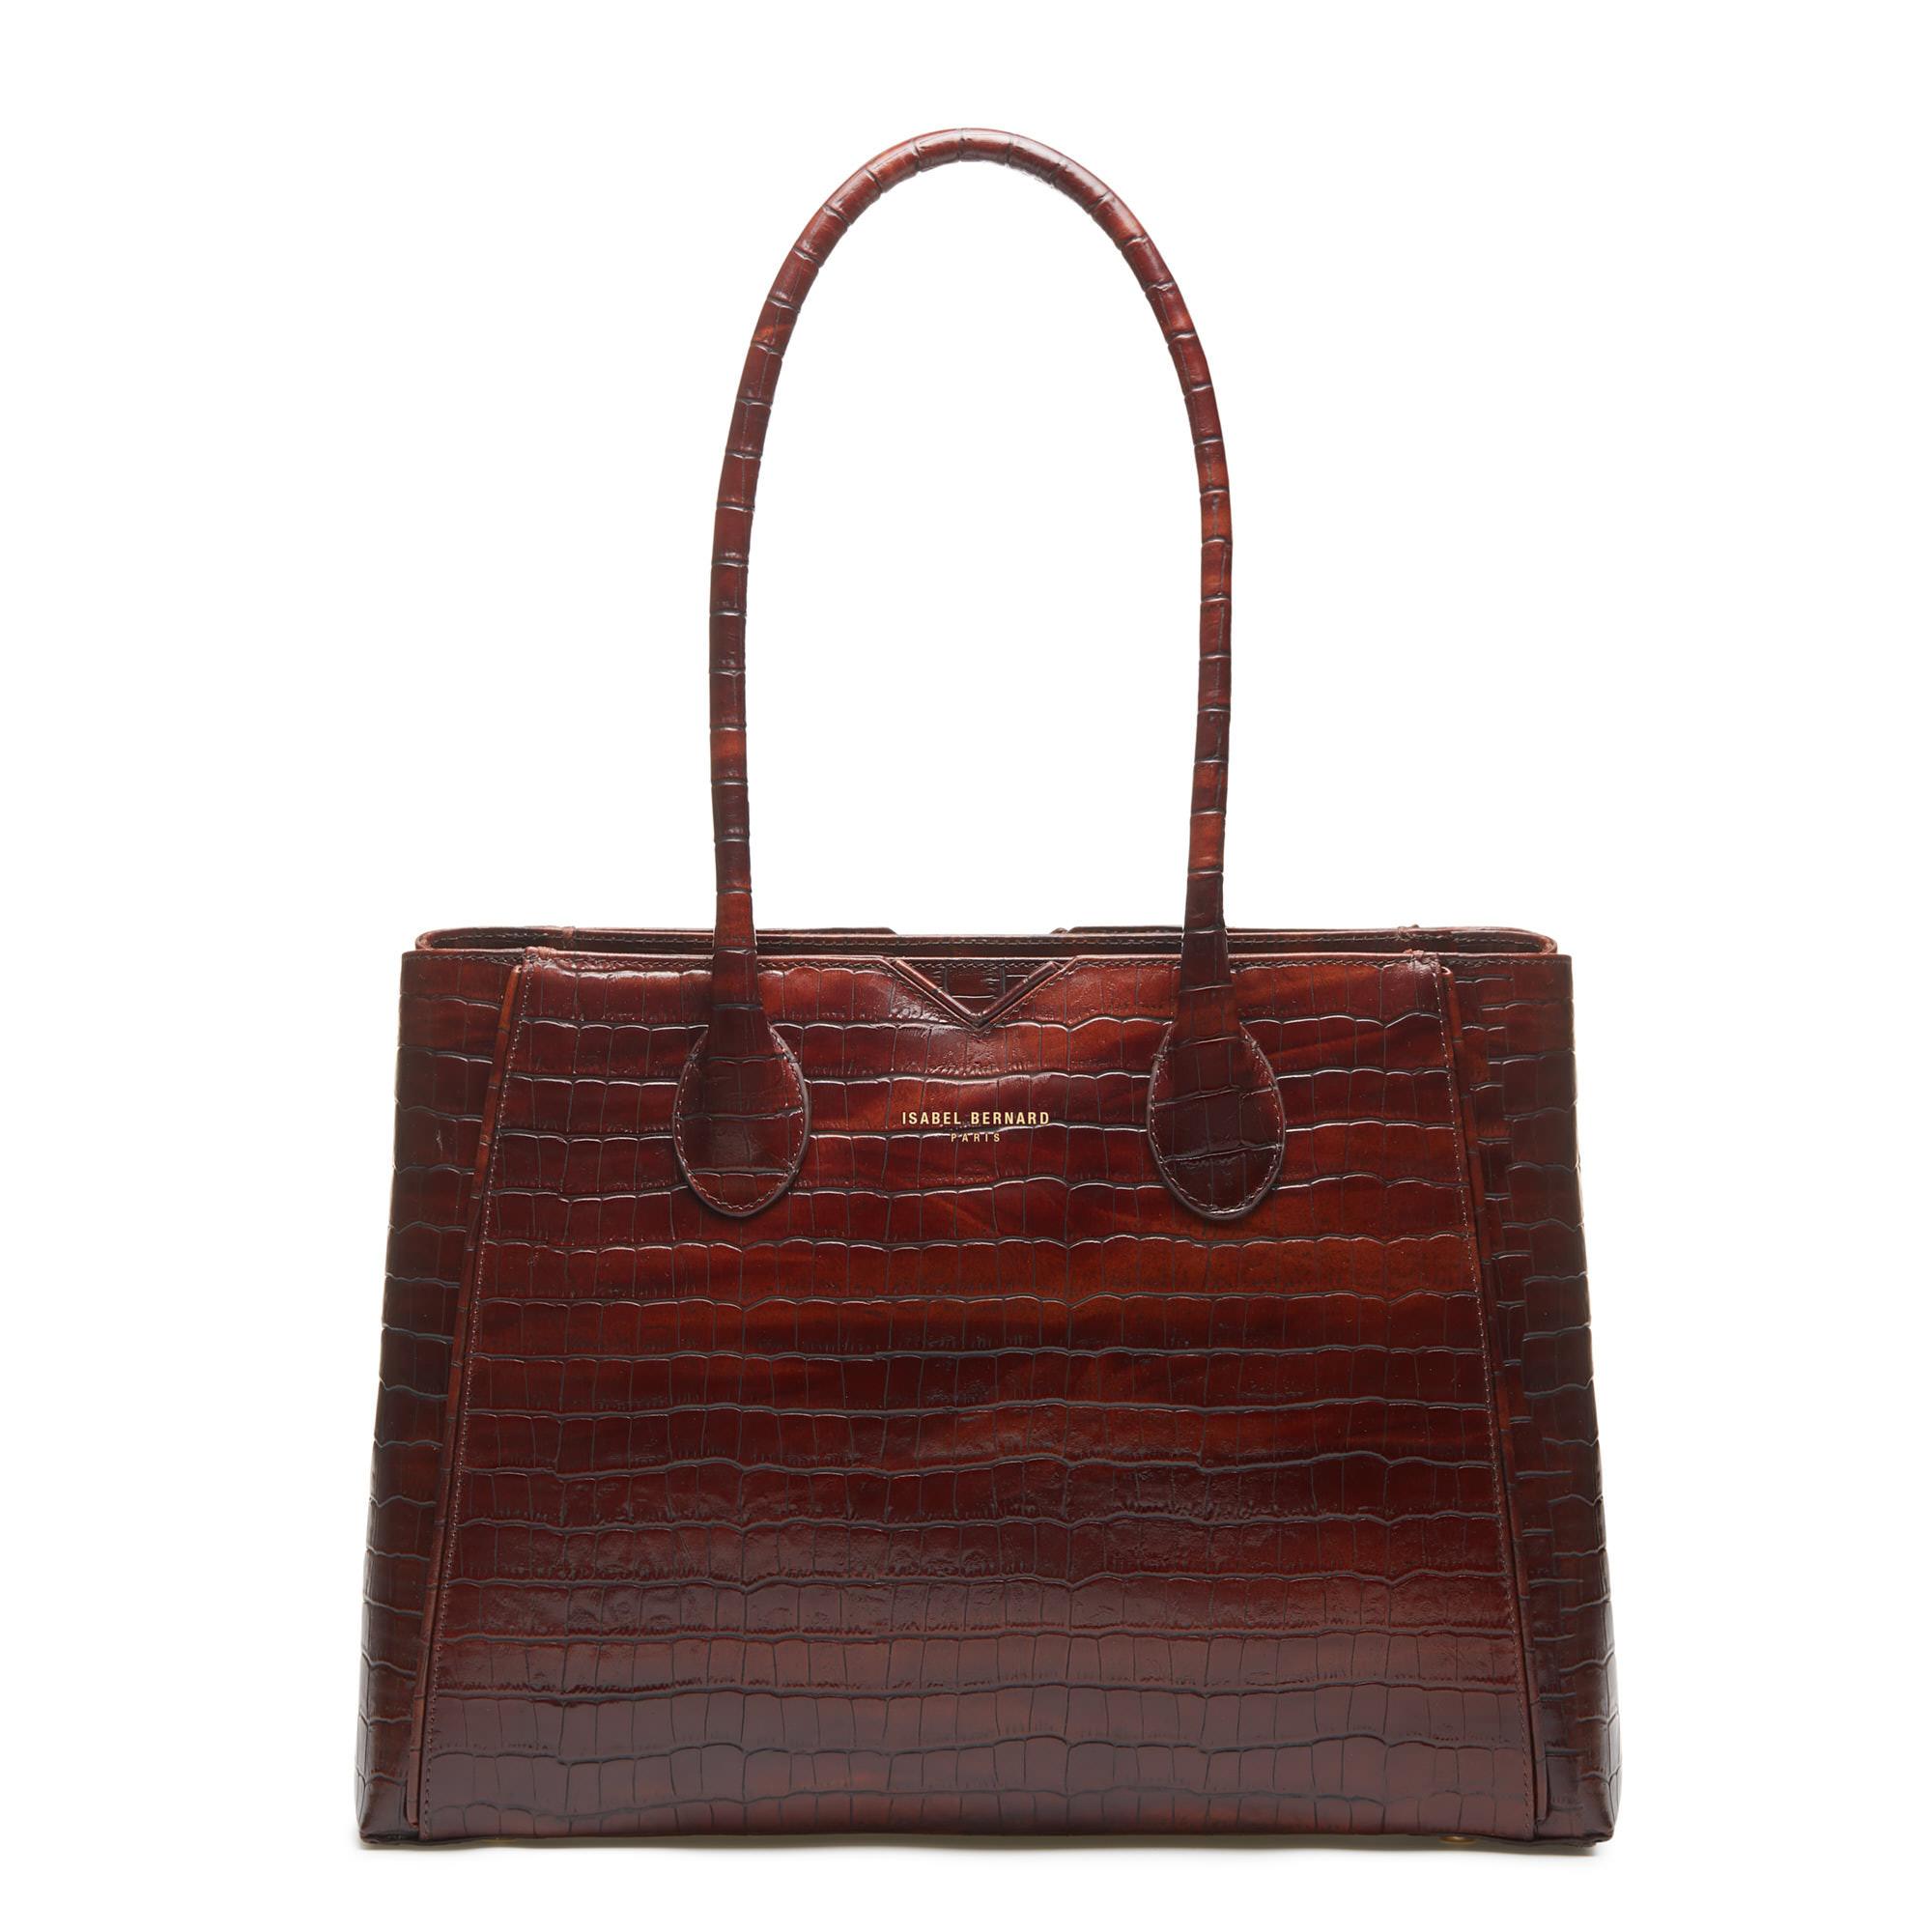 Isabel Bernard Honoré Cloe croco brown calfskin leather handbag